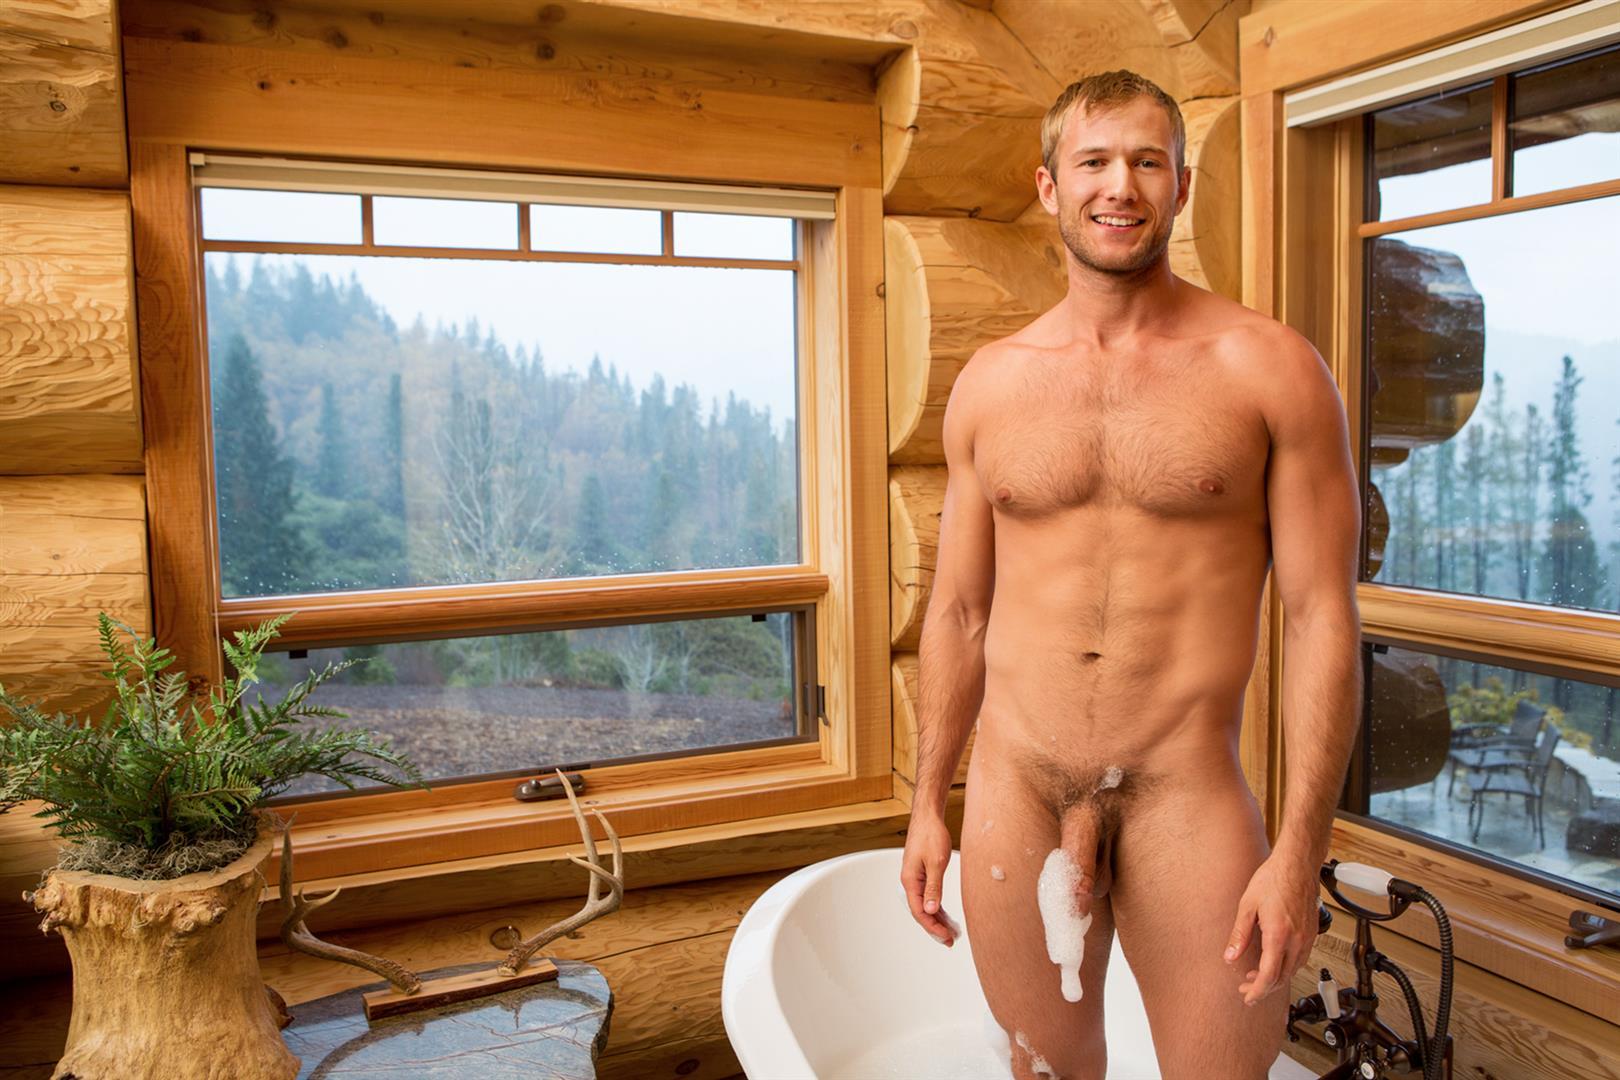 Sean-Cody-Winter-Getaway-Day-6-Big-Dick-Hunks-Fucking-Bareback-Amateur-Gay-Porn-02 Sean Cody Takes The Boys On A 8-Day Bareback Winter Getaway